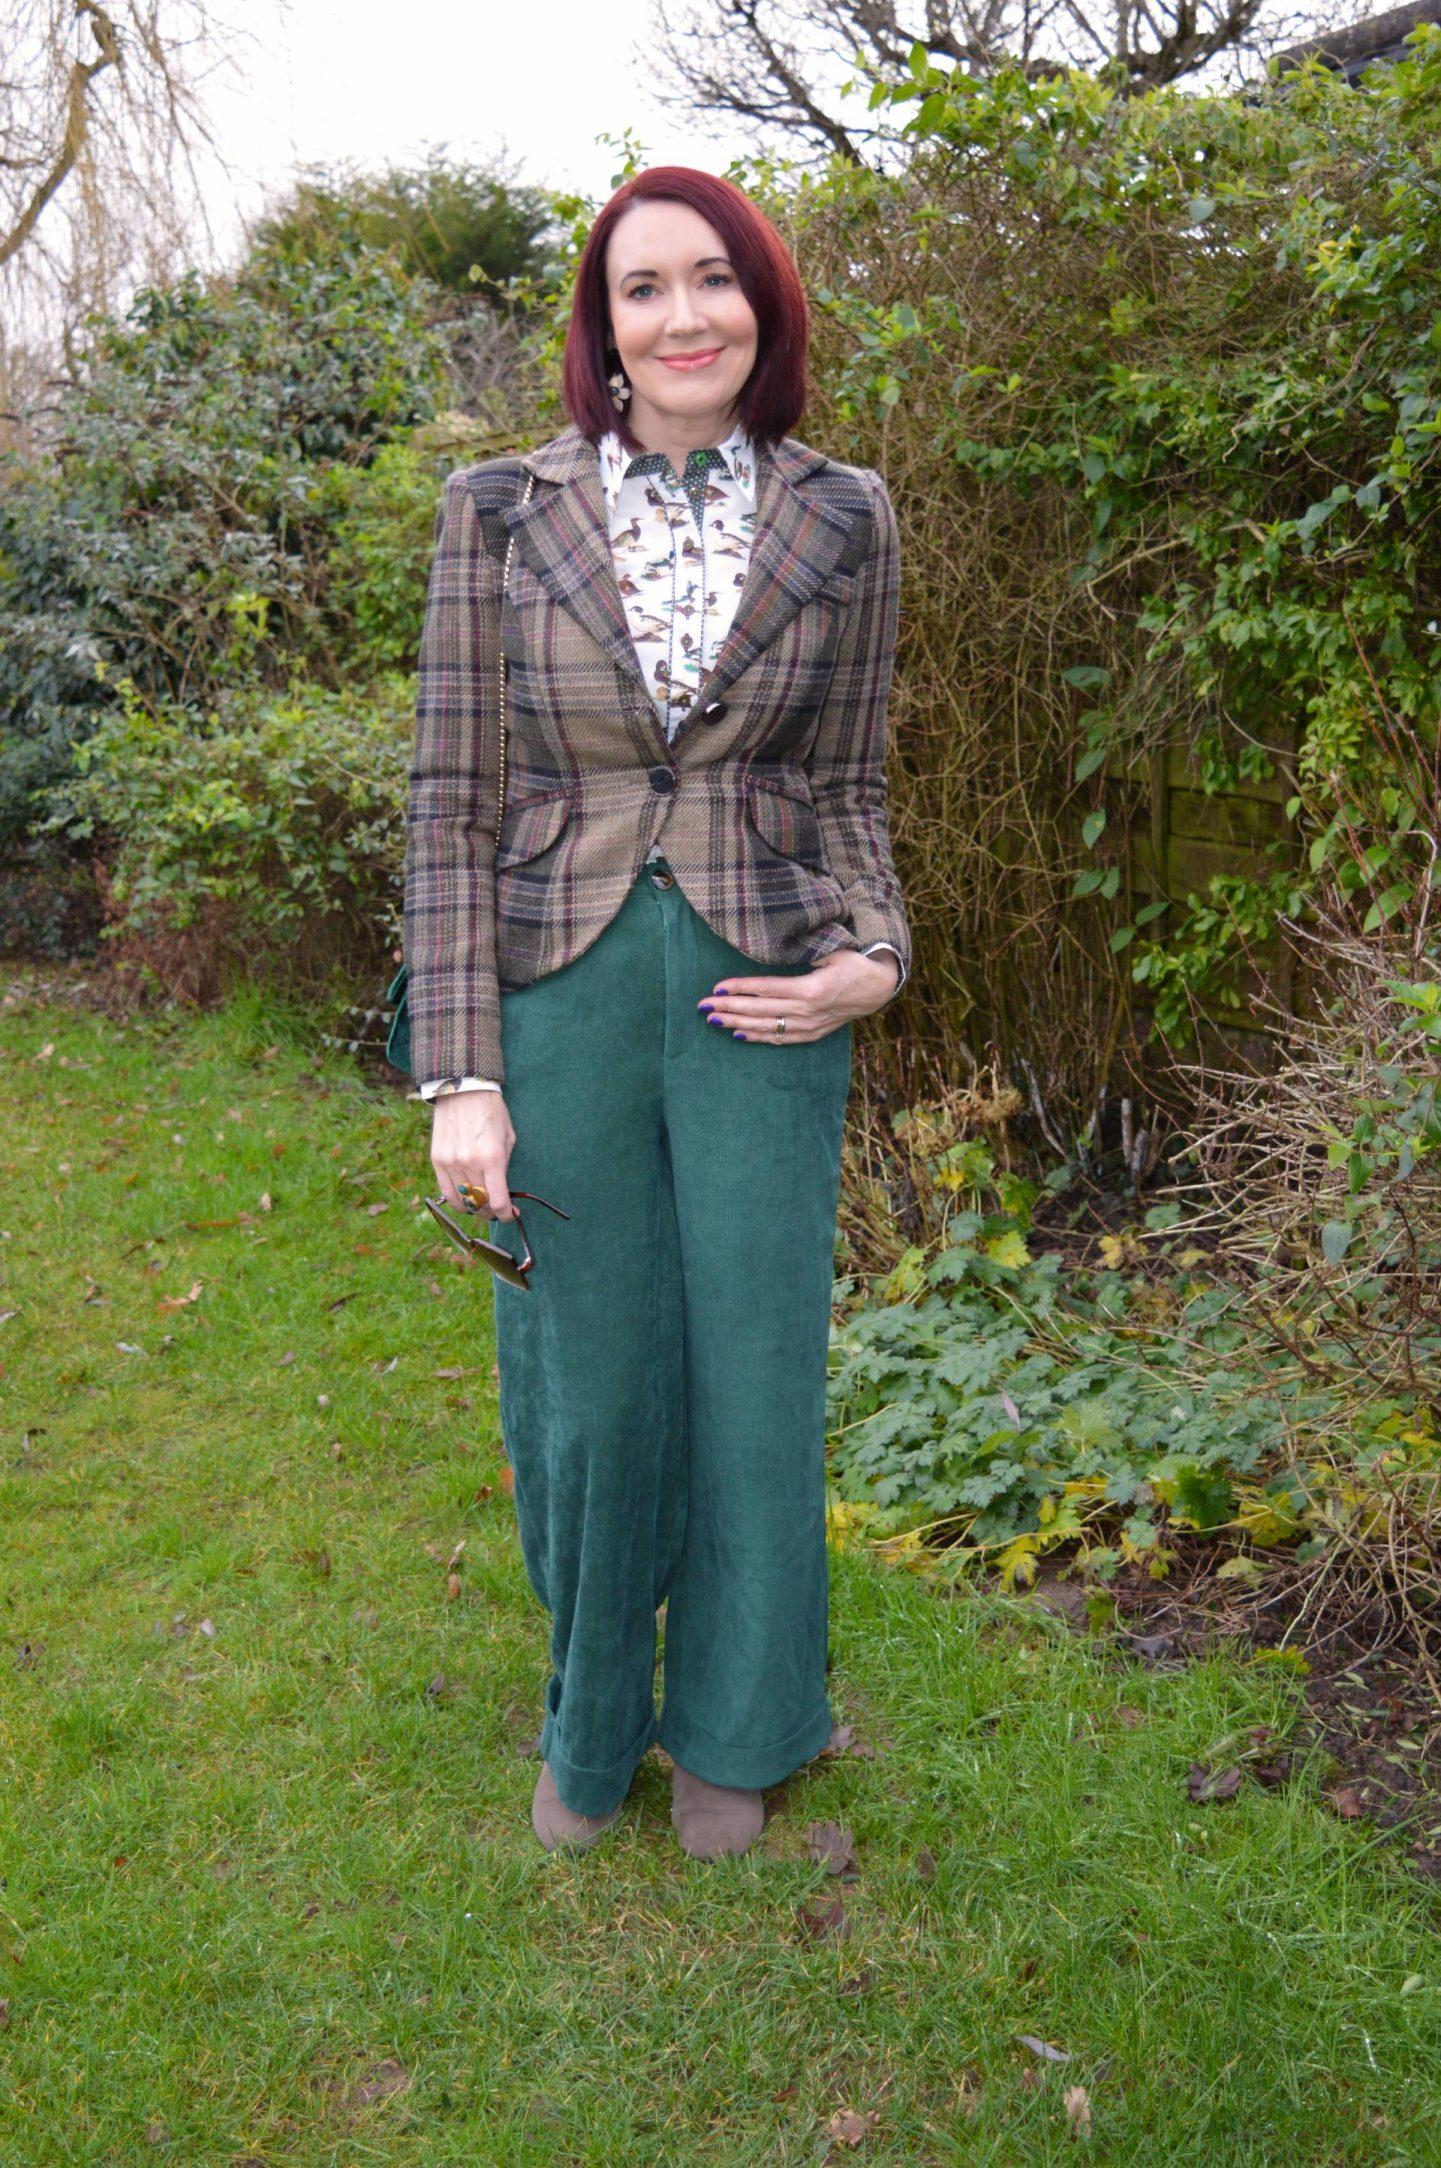 Salamander Shirts Duck Print Cotton Shirt, Coast baby cord forest green trousers, Mango tweed jacket